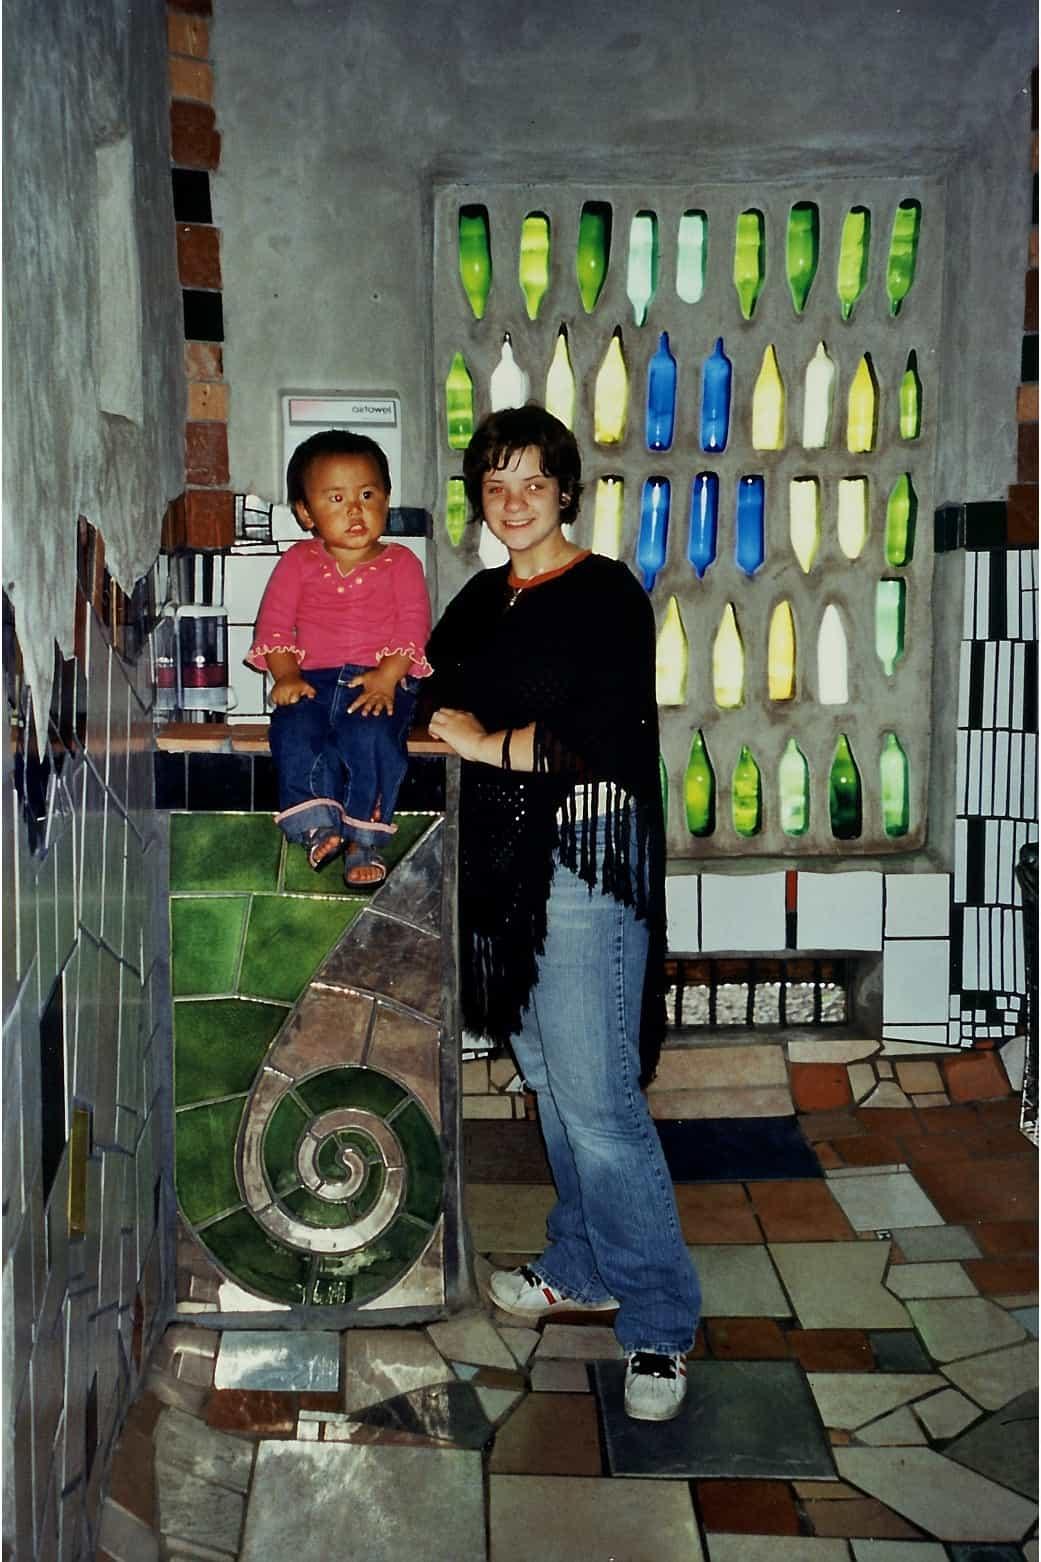 Hundertwasser Toilets New Zealand Sophies World Travel